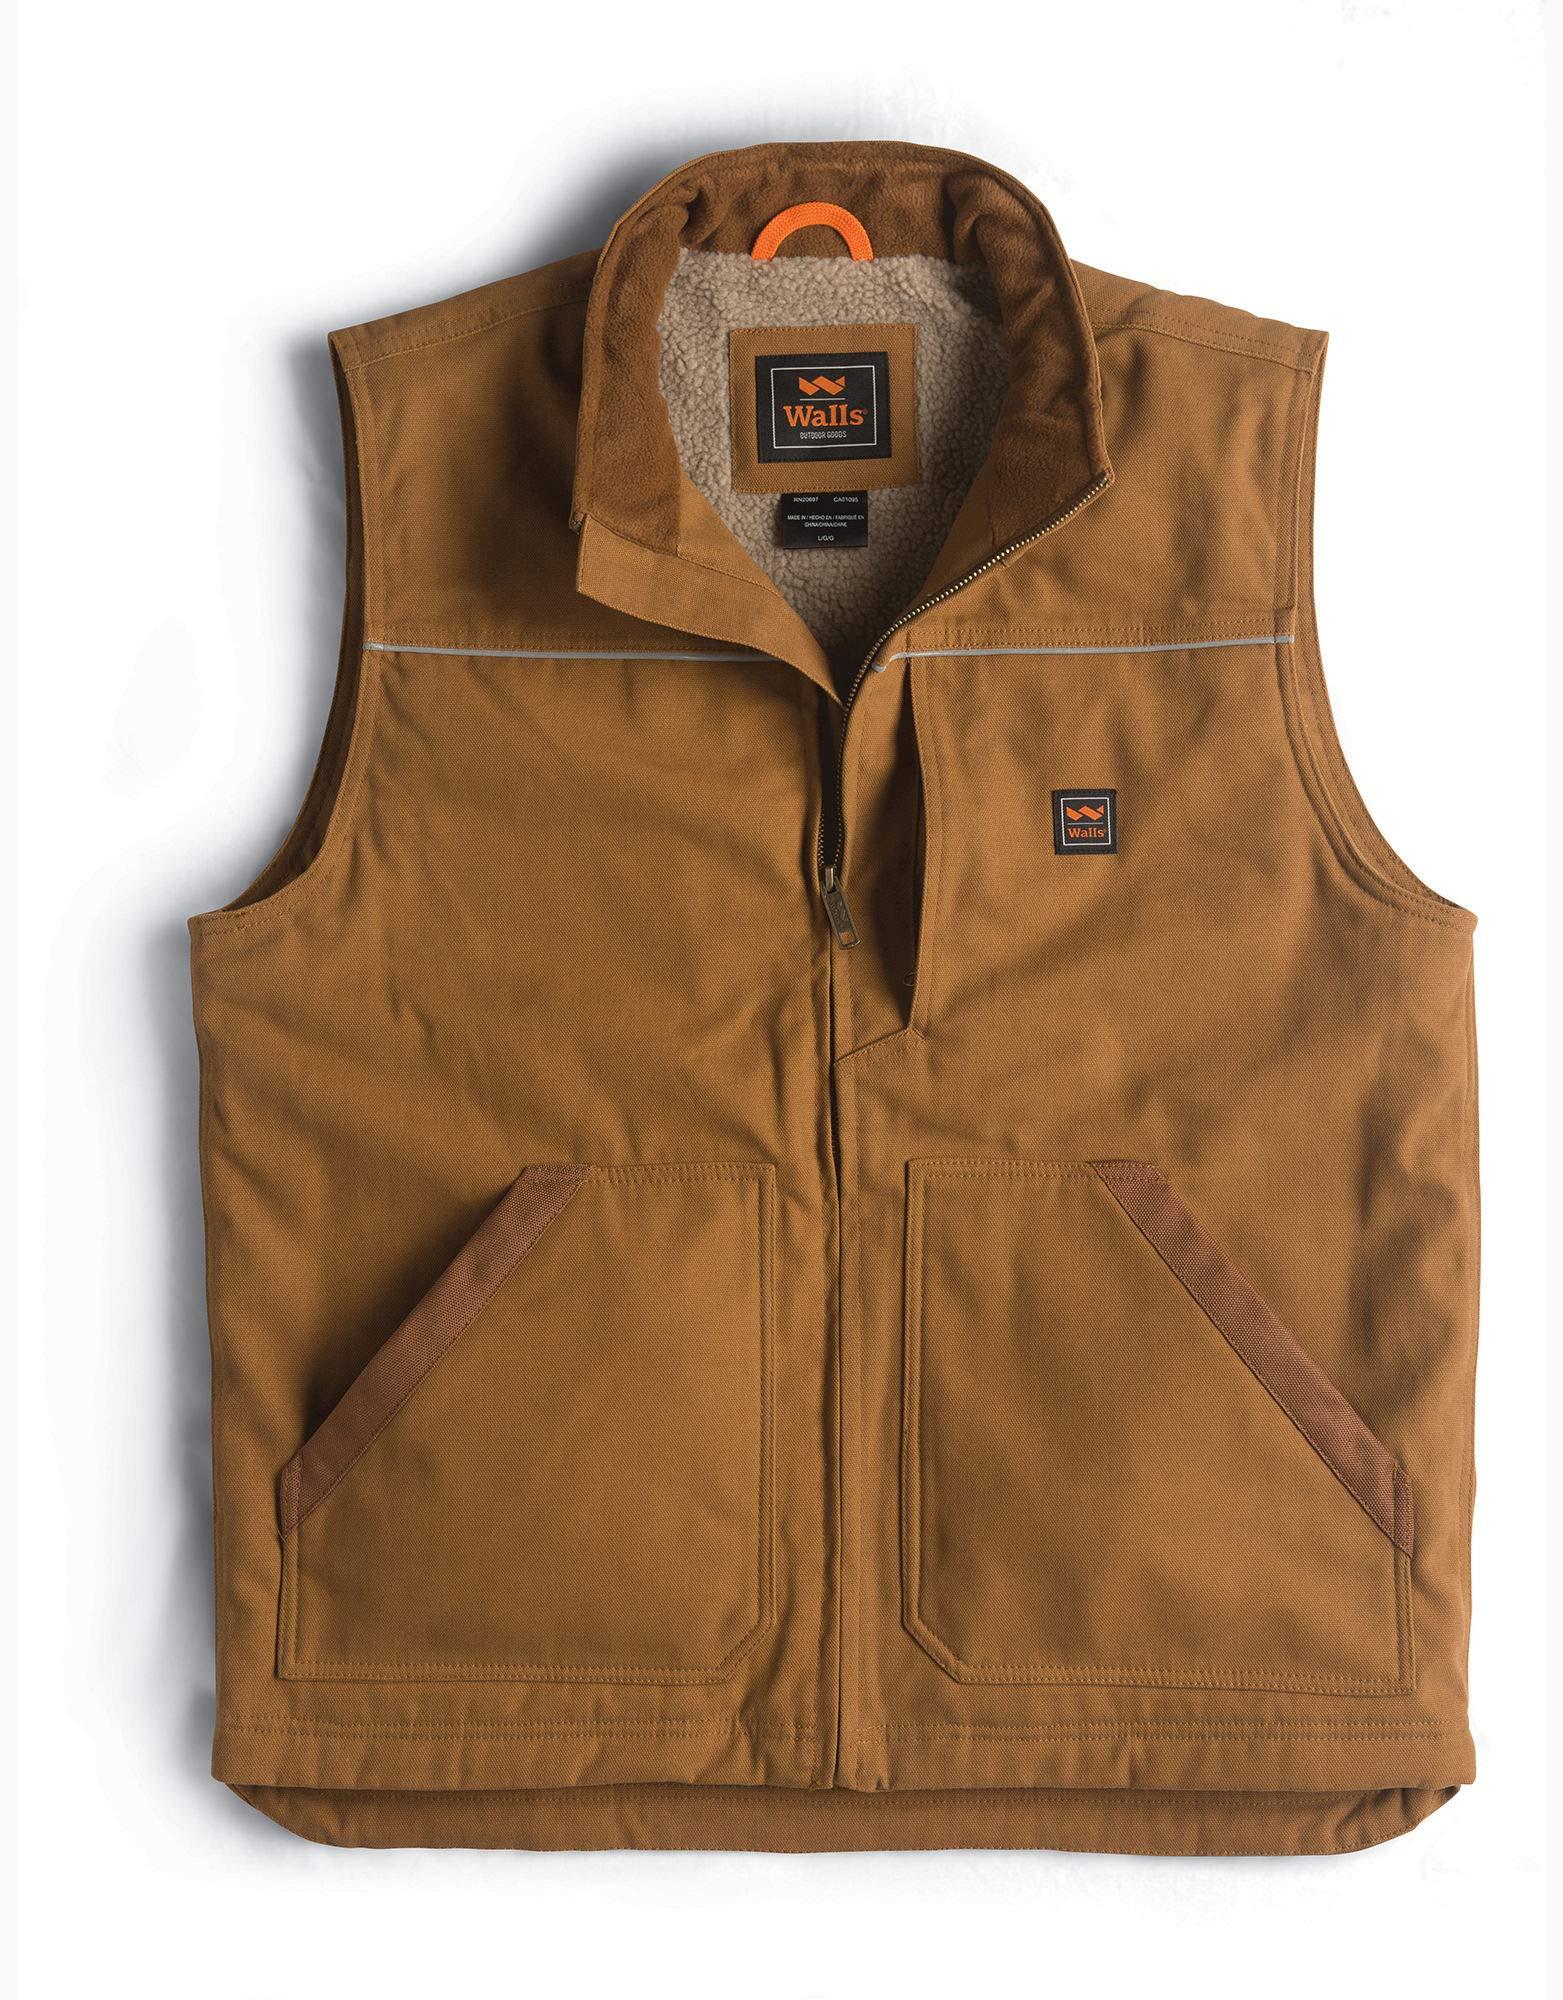 Walls Men's Super Duck Lined Vest, Pecan, Large by Walls